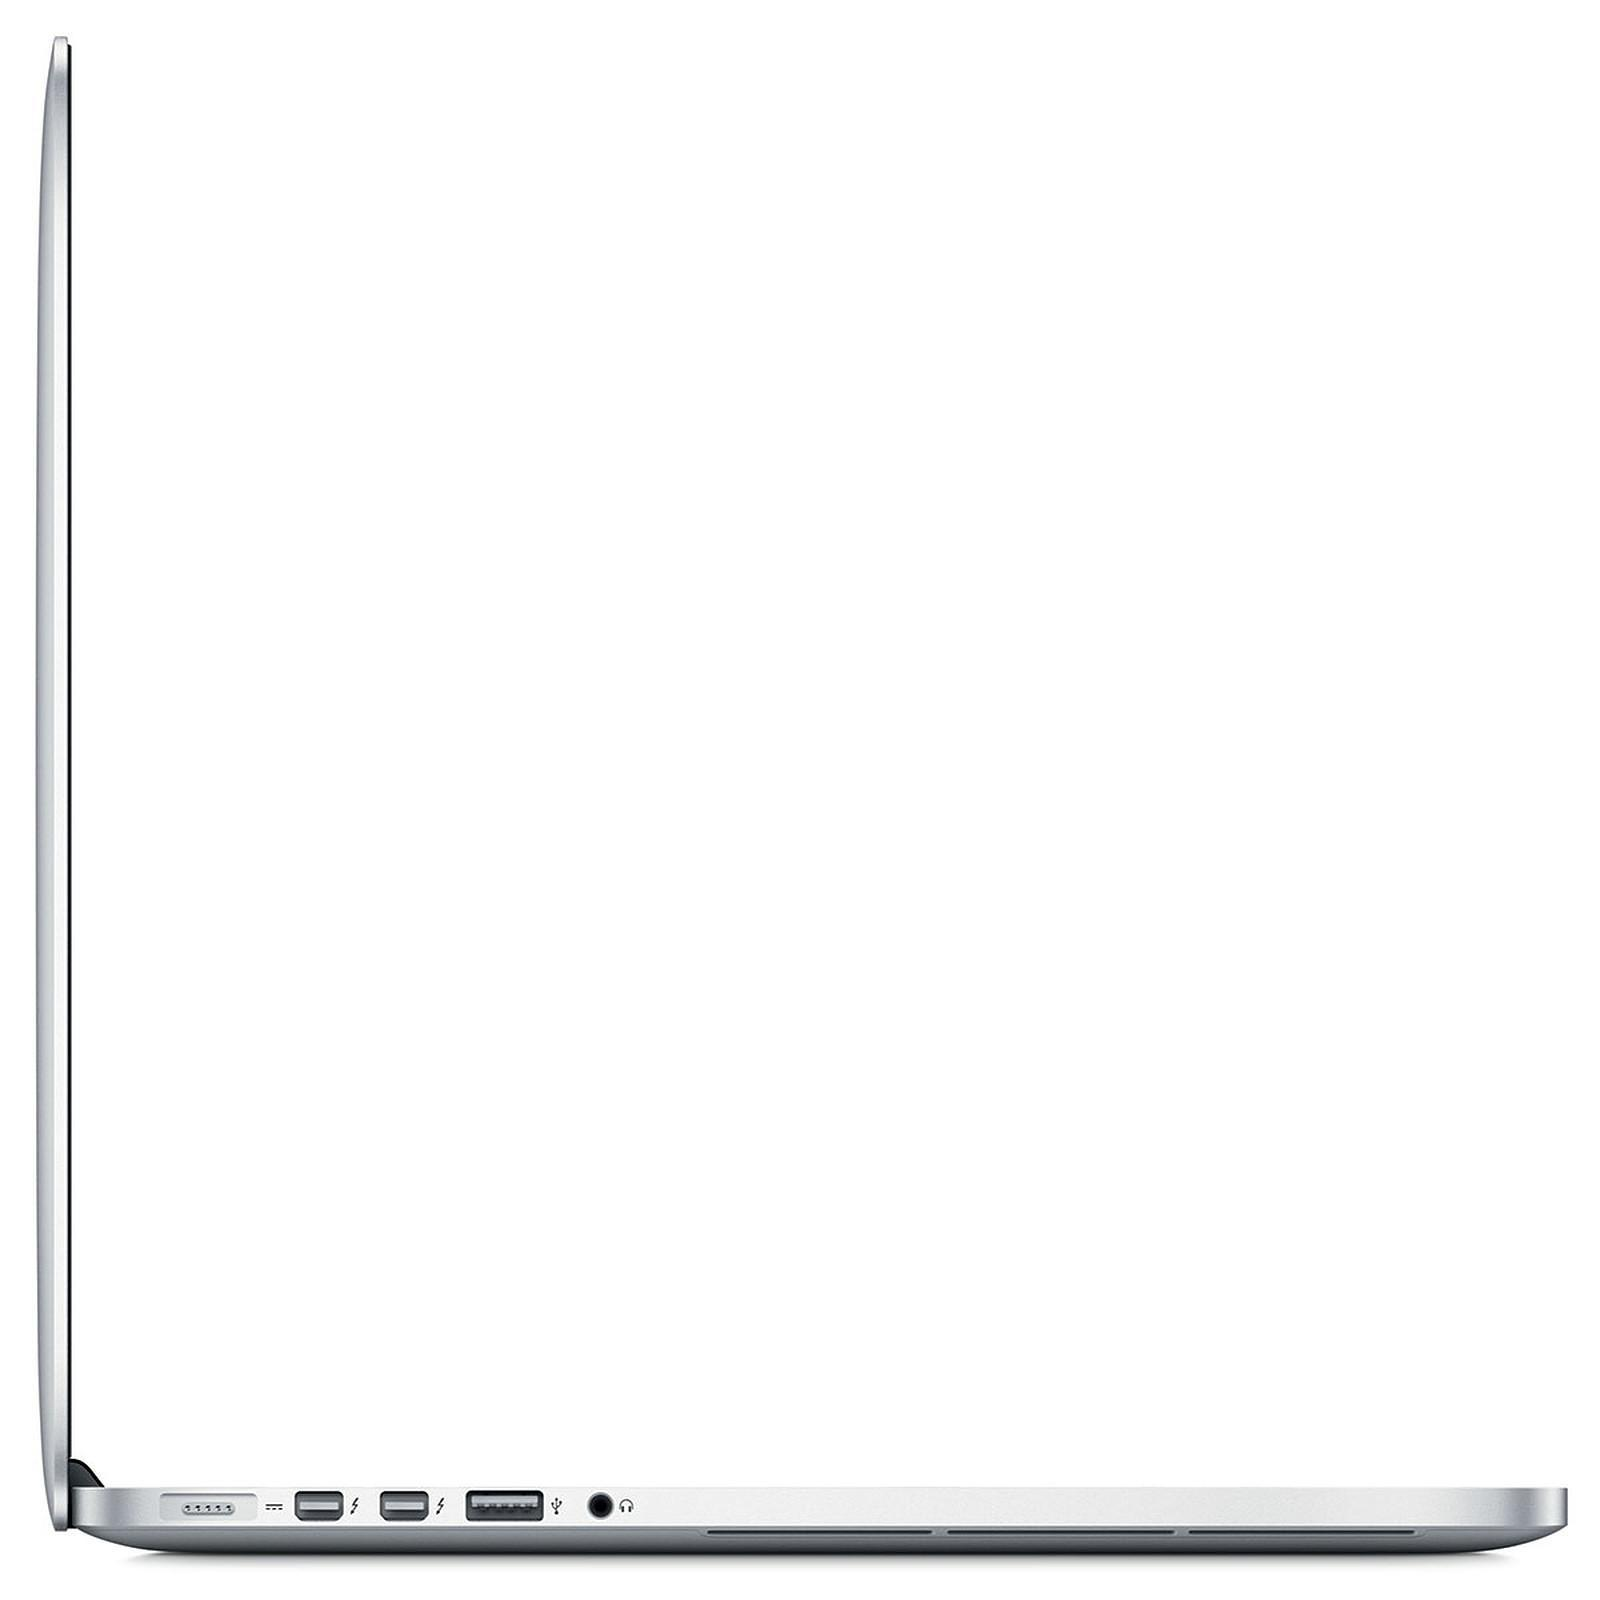 "MacBook Pro Retina 15"" (2013) - Core i7 - 16GB - SSD 512 Gb QWERTY - Αγγλικά (US)"